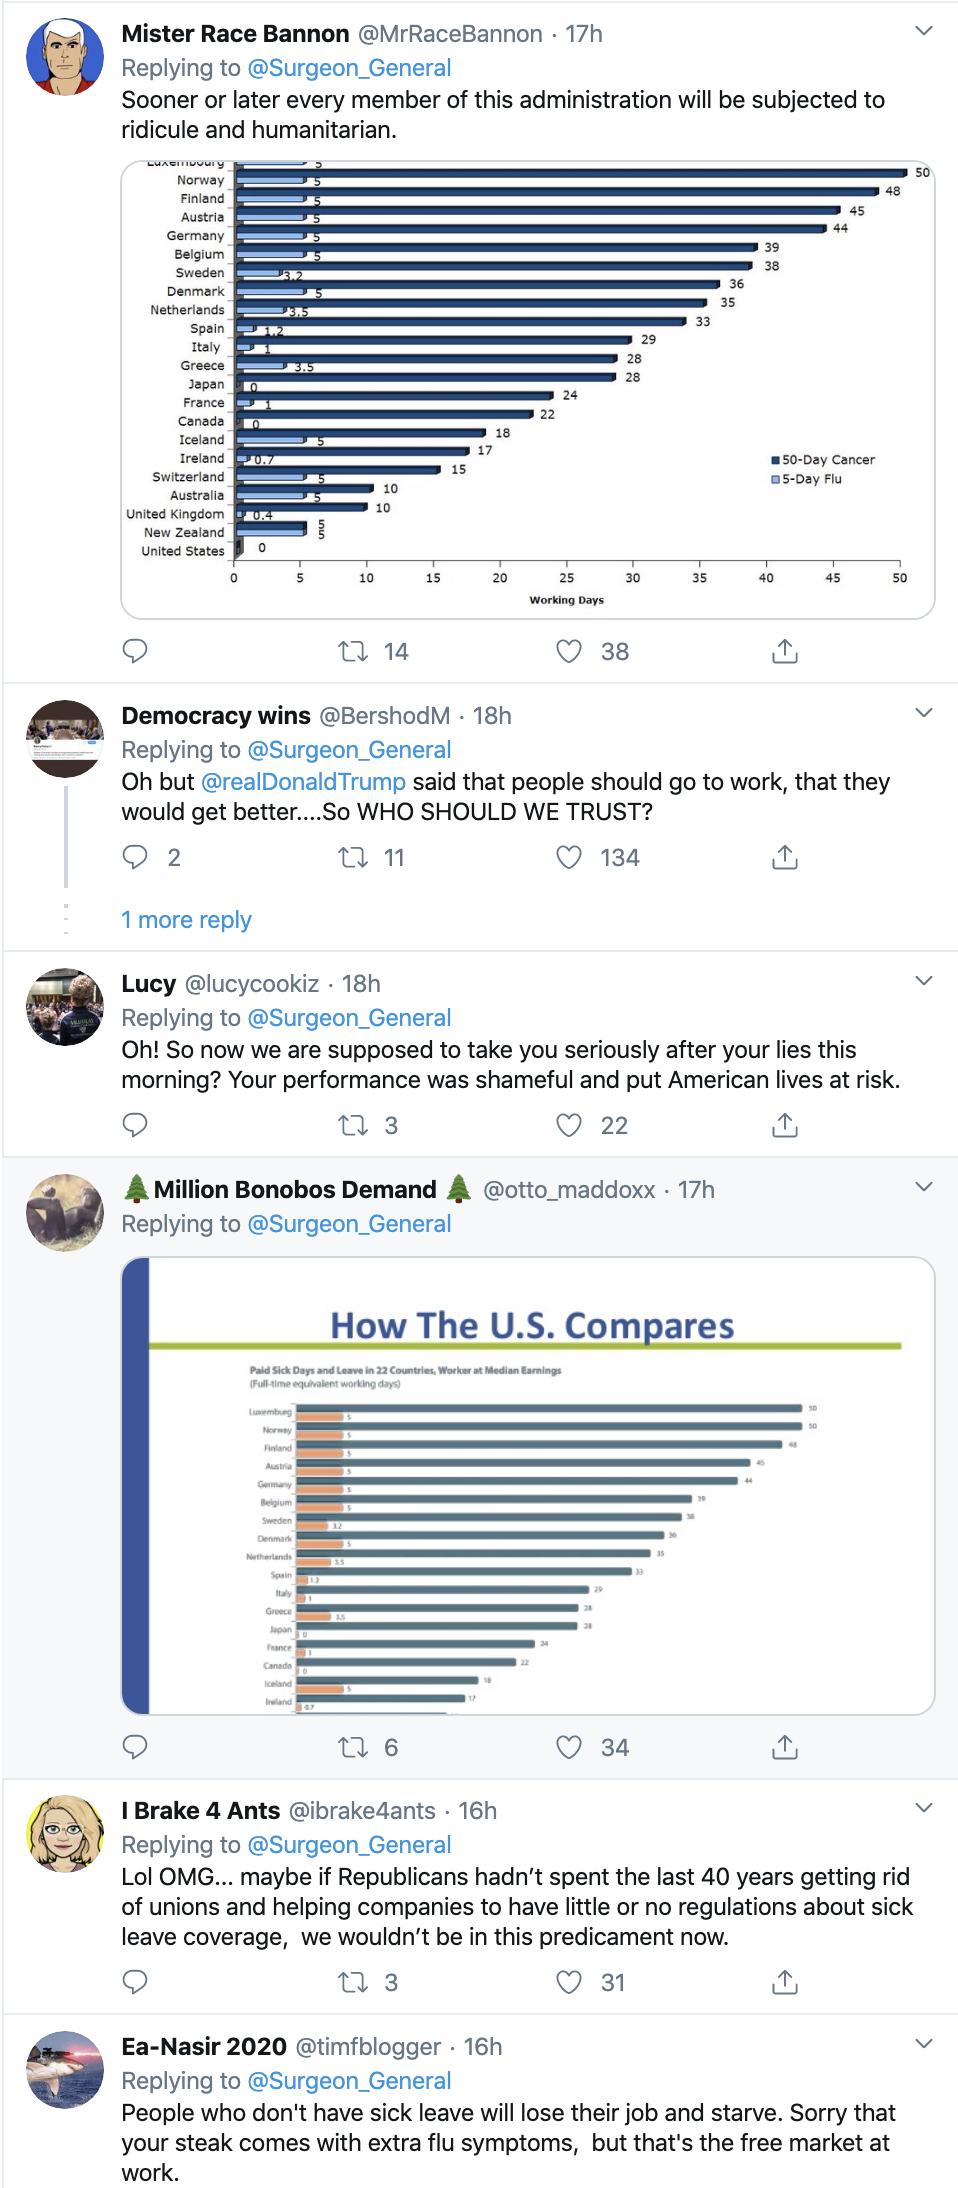 Screen-Shot-2020-03-09-at-12.29.49-PM Schiff Bypasses Trump & Announces Coronavirus Response Plan To America Economy Featured Healthcare Politics Top Stories